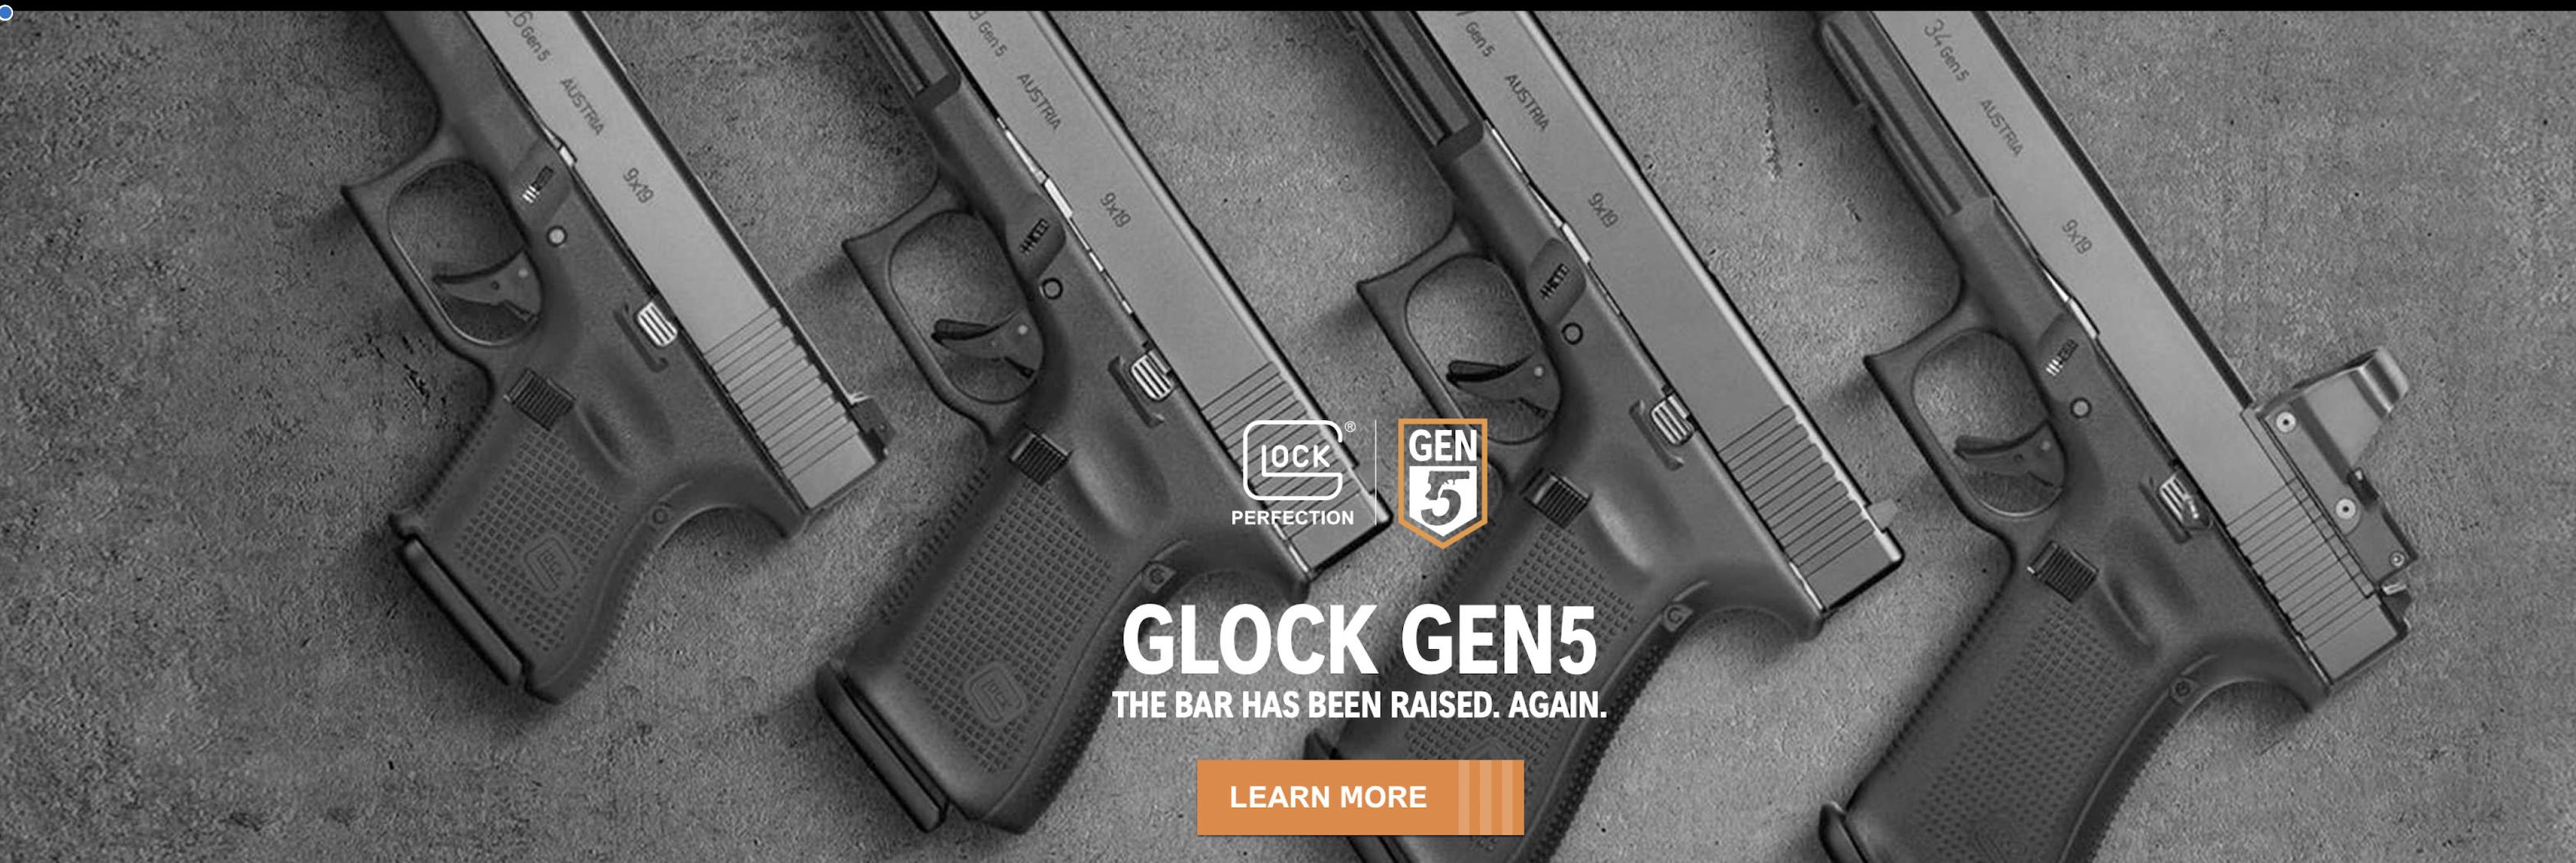 https://www.precisionarsenal.com/brands/glock